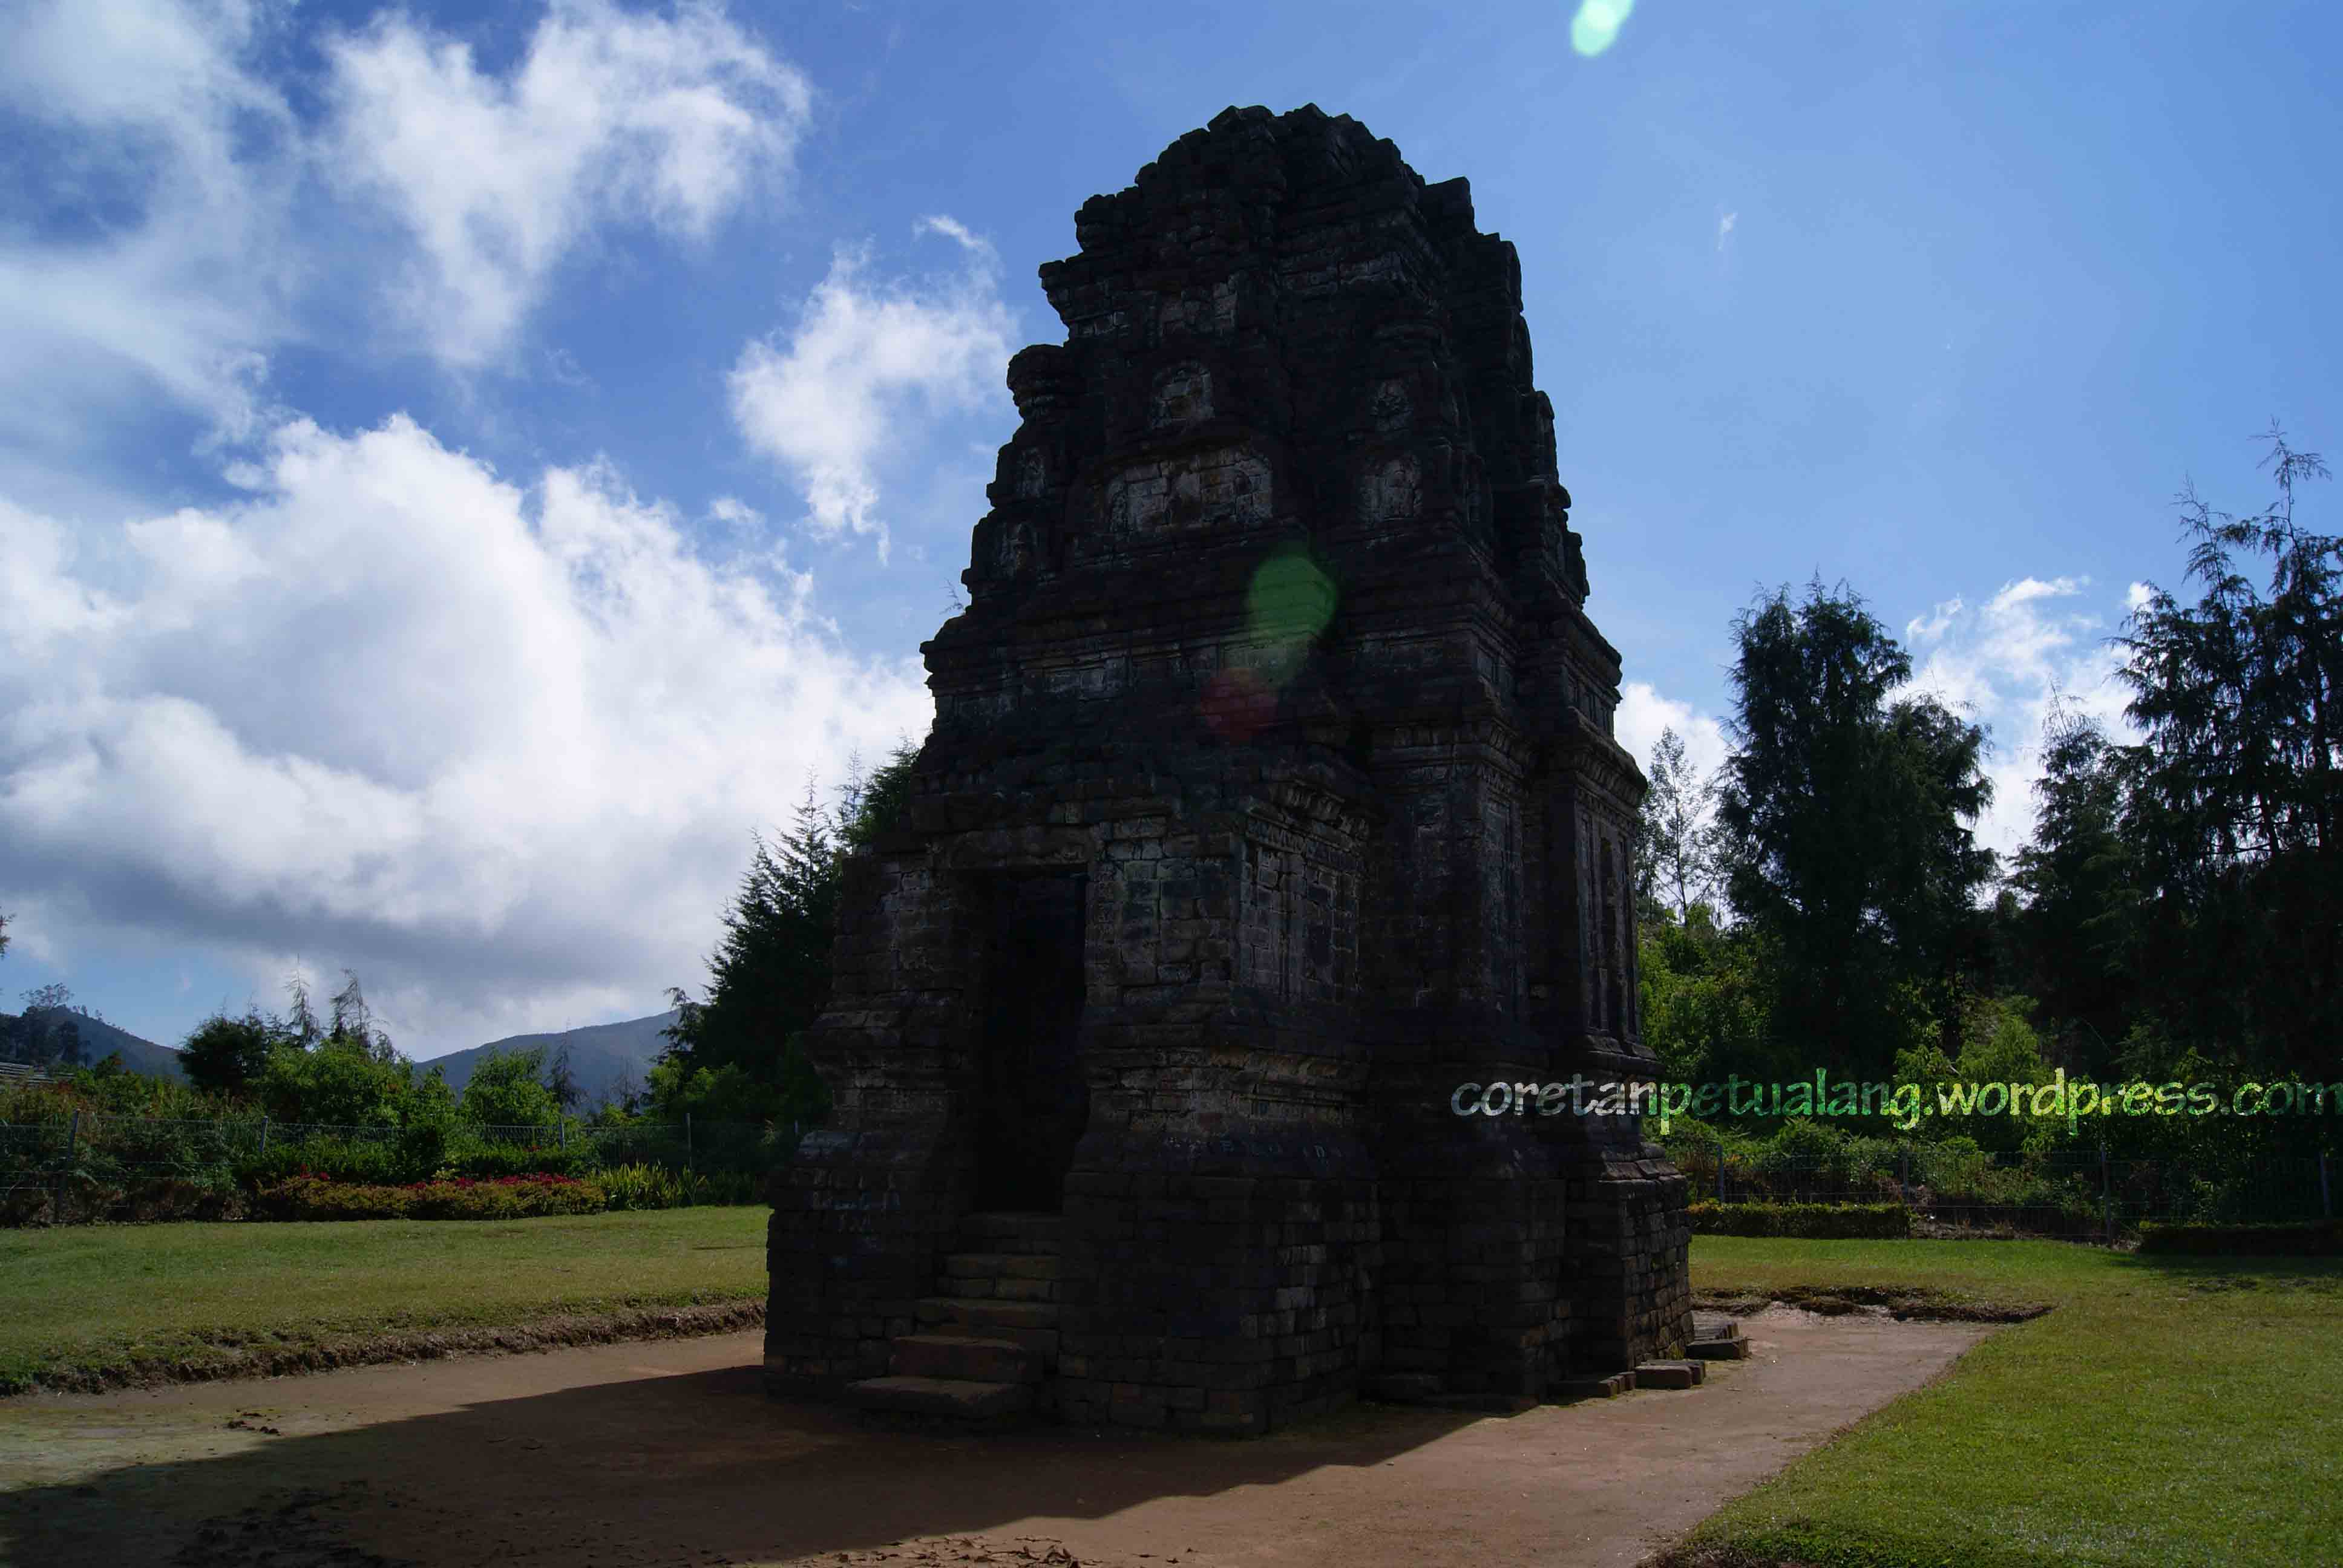 Dieng Plateau Love Season 2 Budaya Candi Dataran Bima Gatotkaca